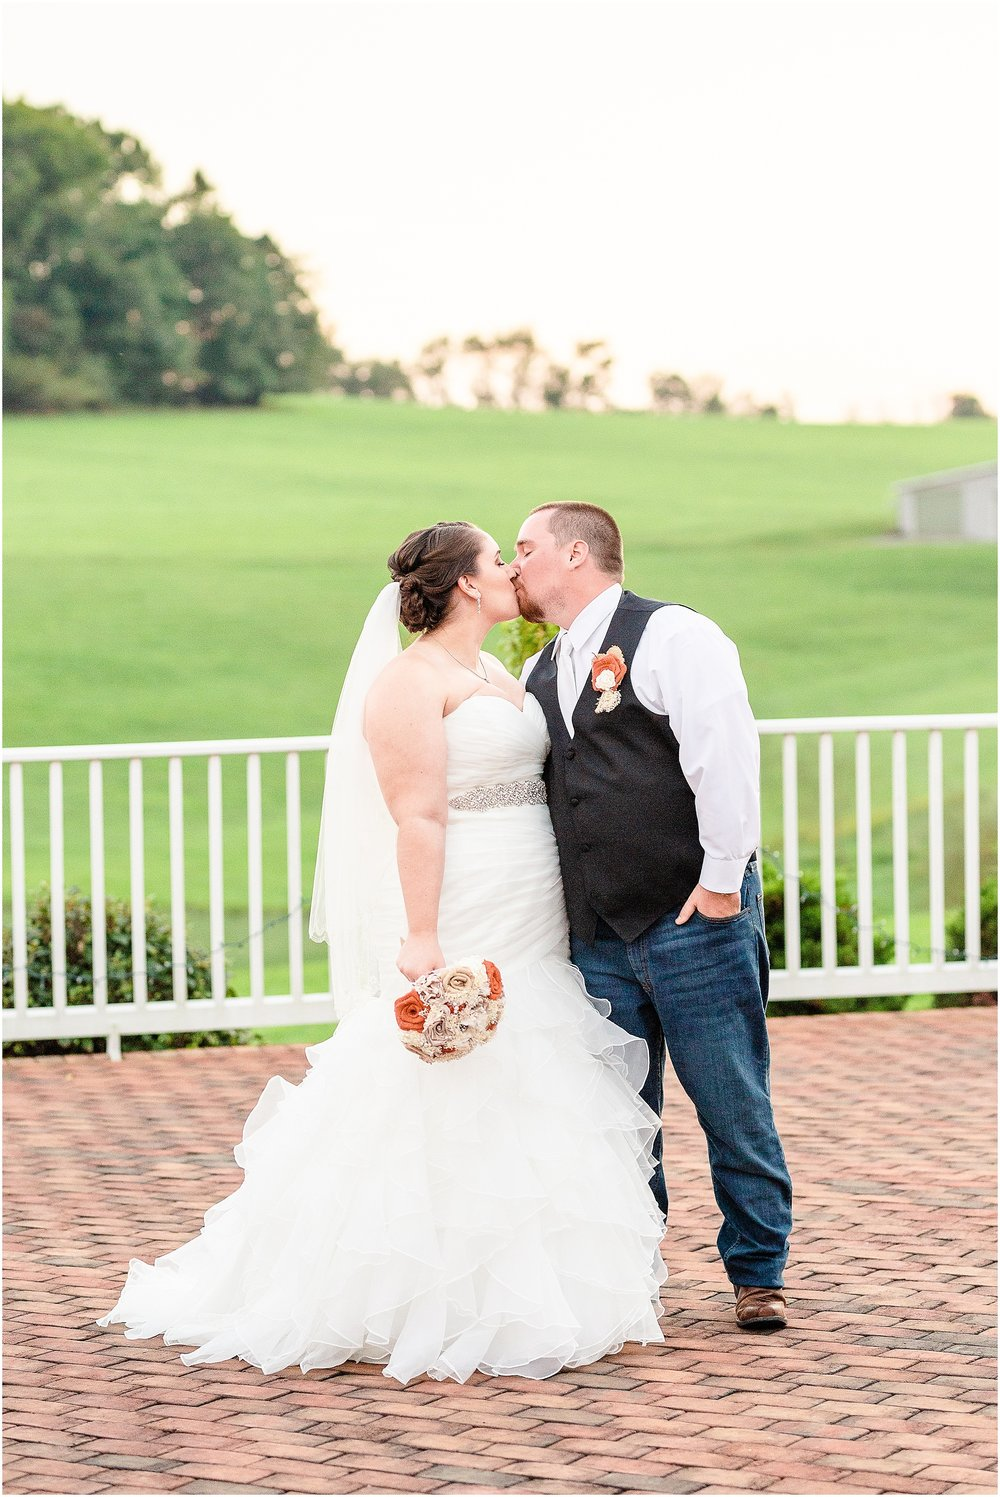 Morningside-inn-wedding-photos_0222.jpg